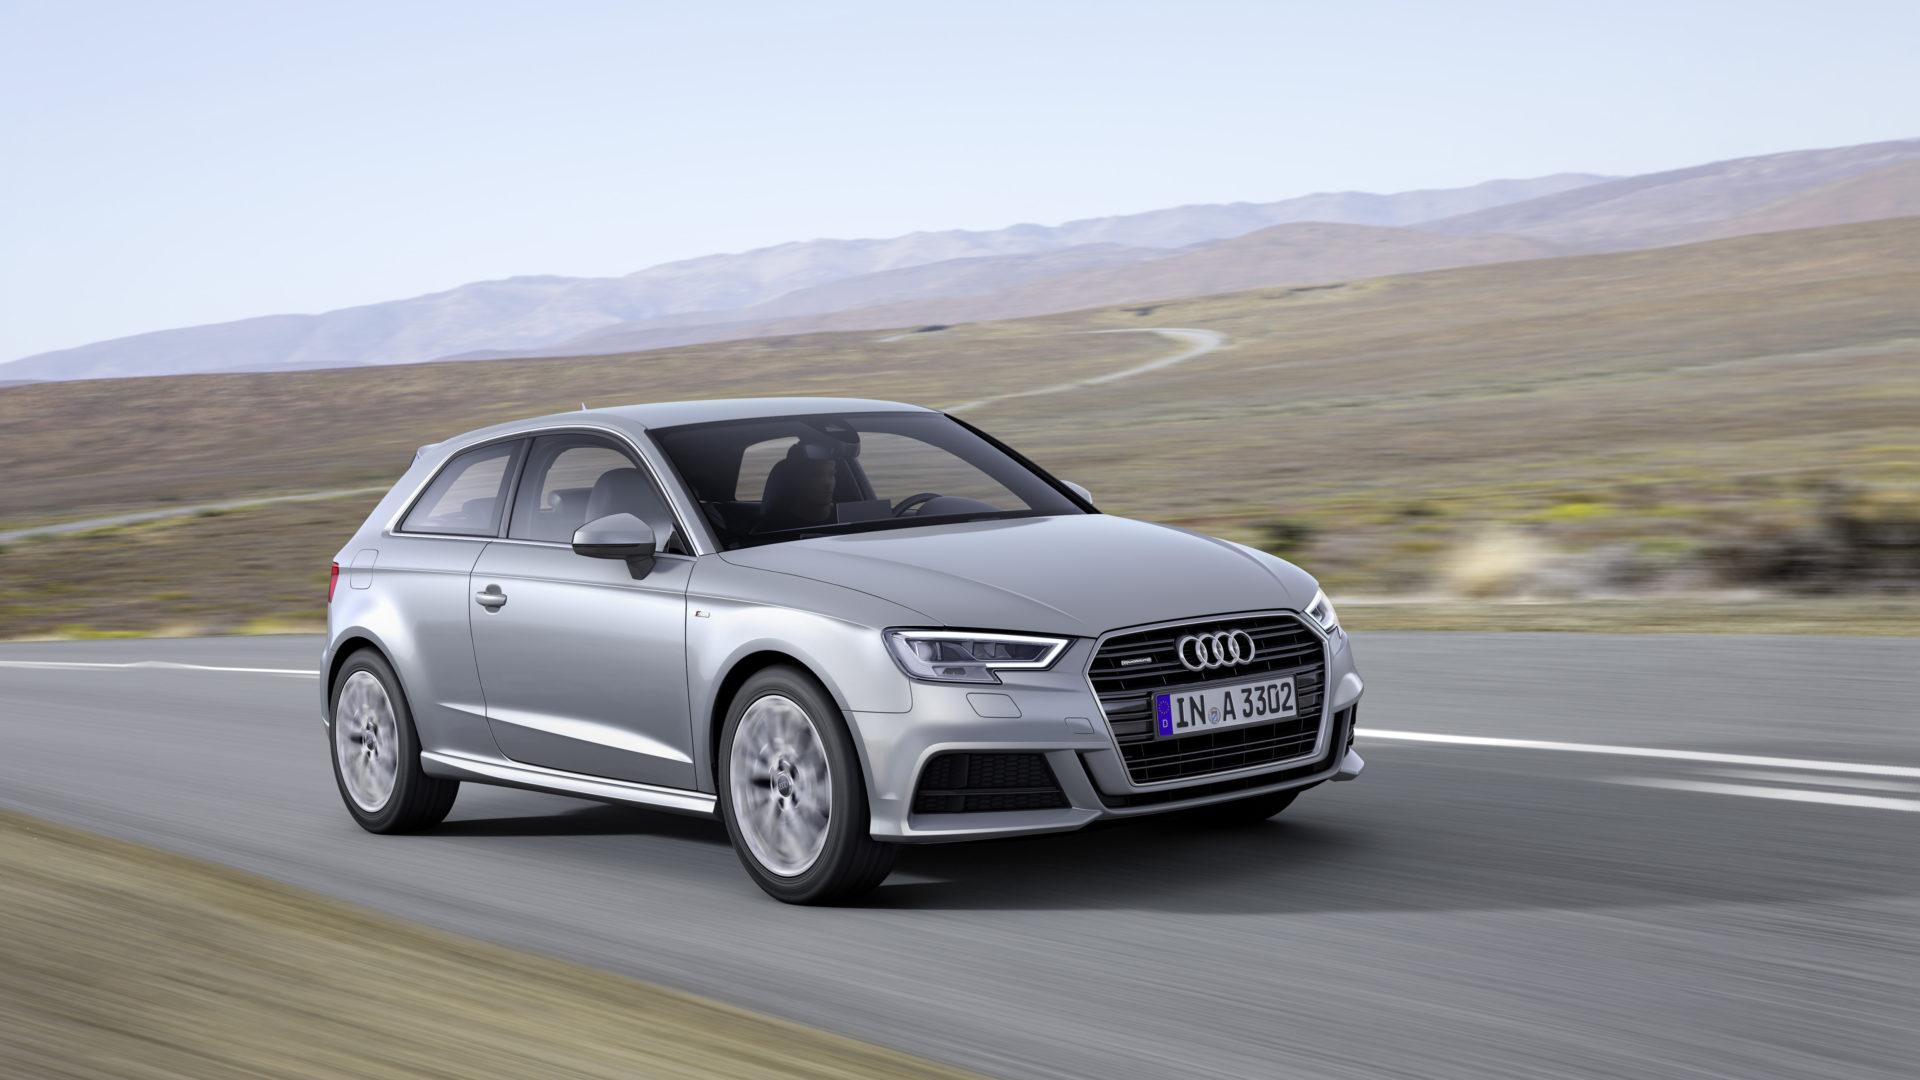 Audi A3 Comparatif des motorisations